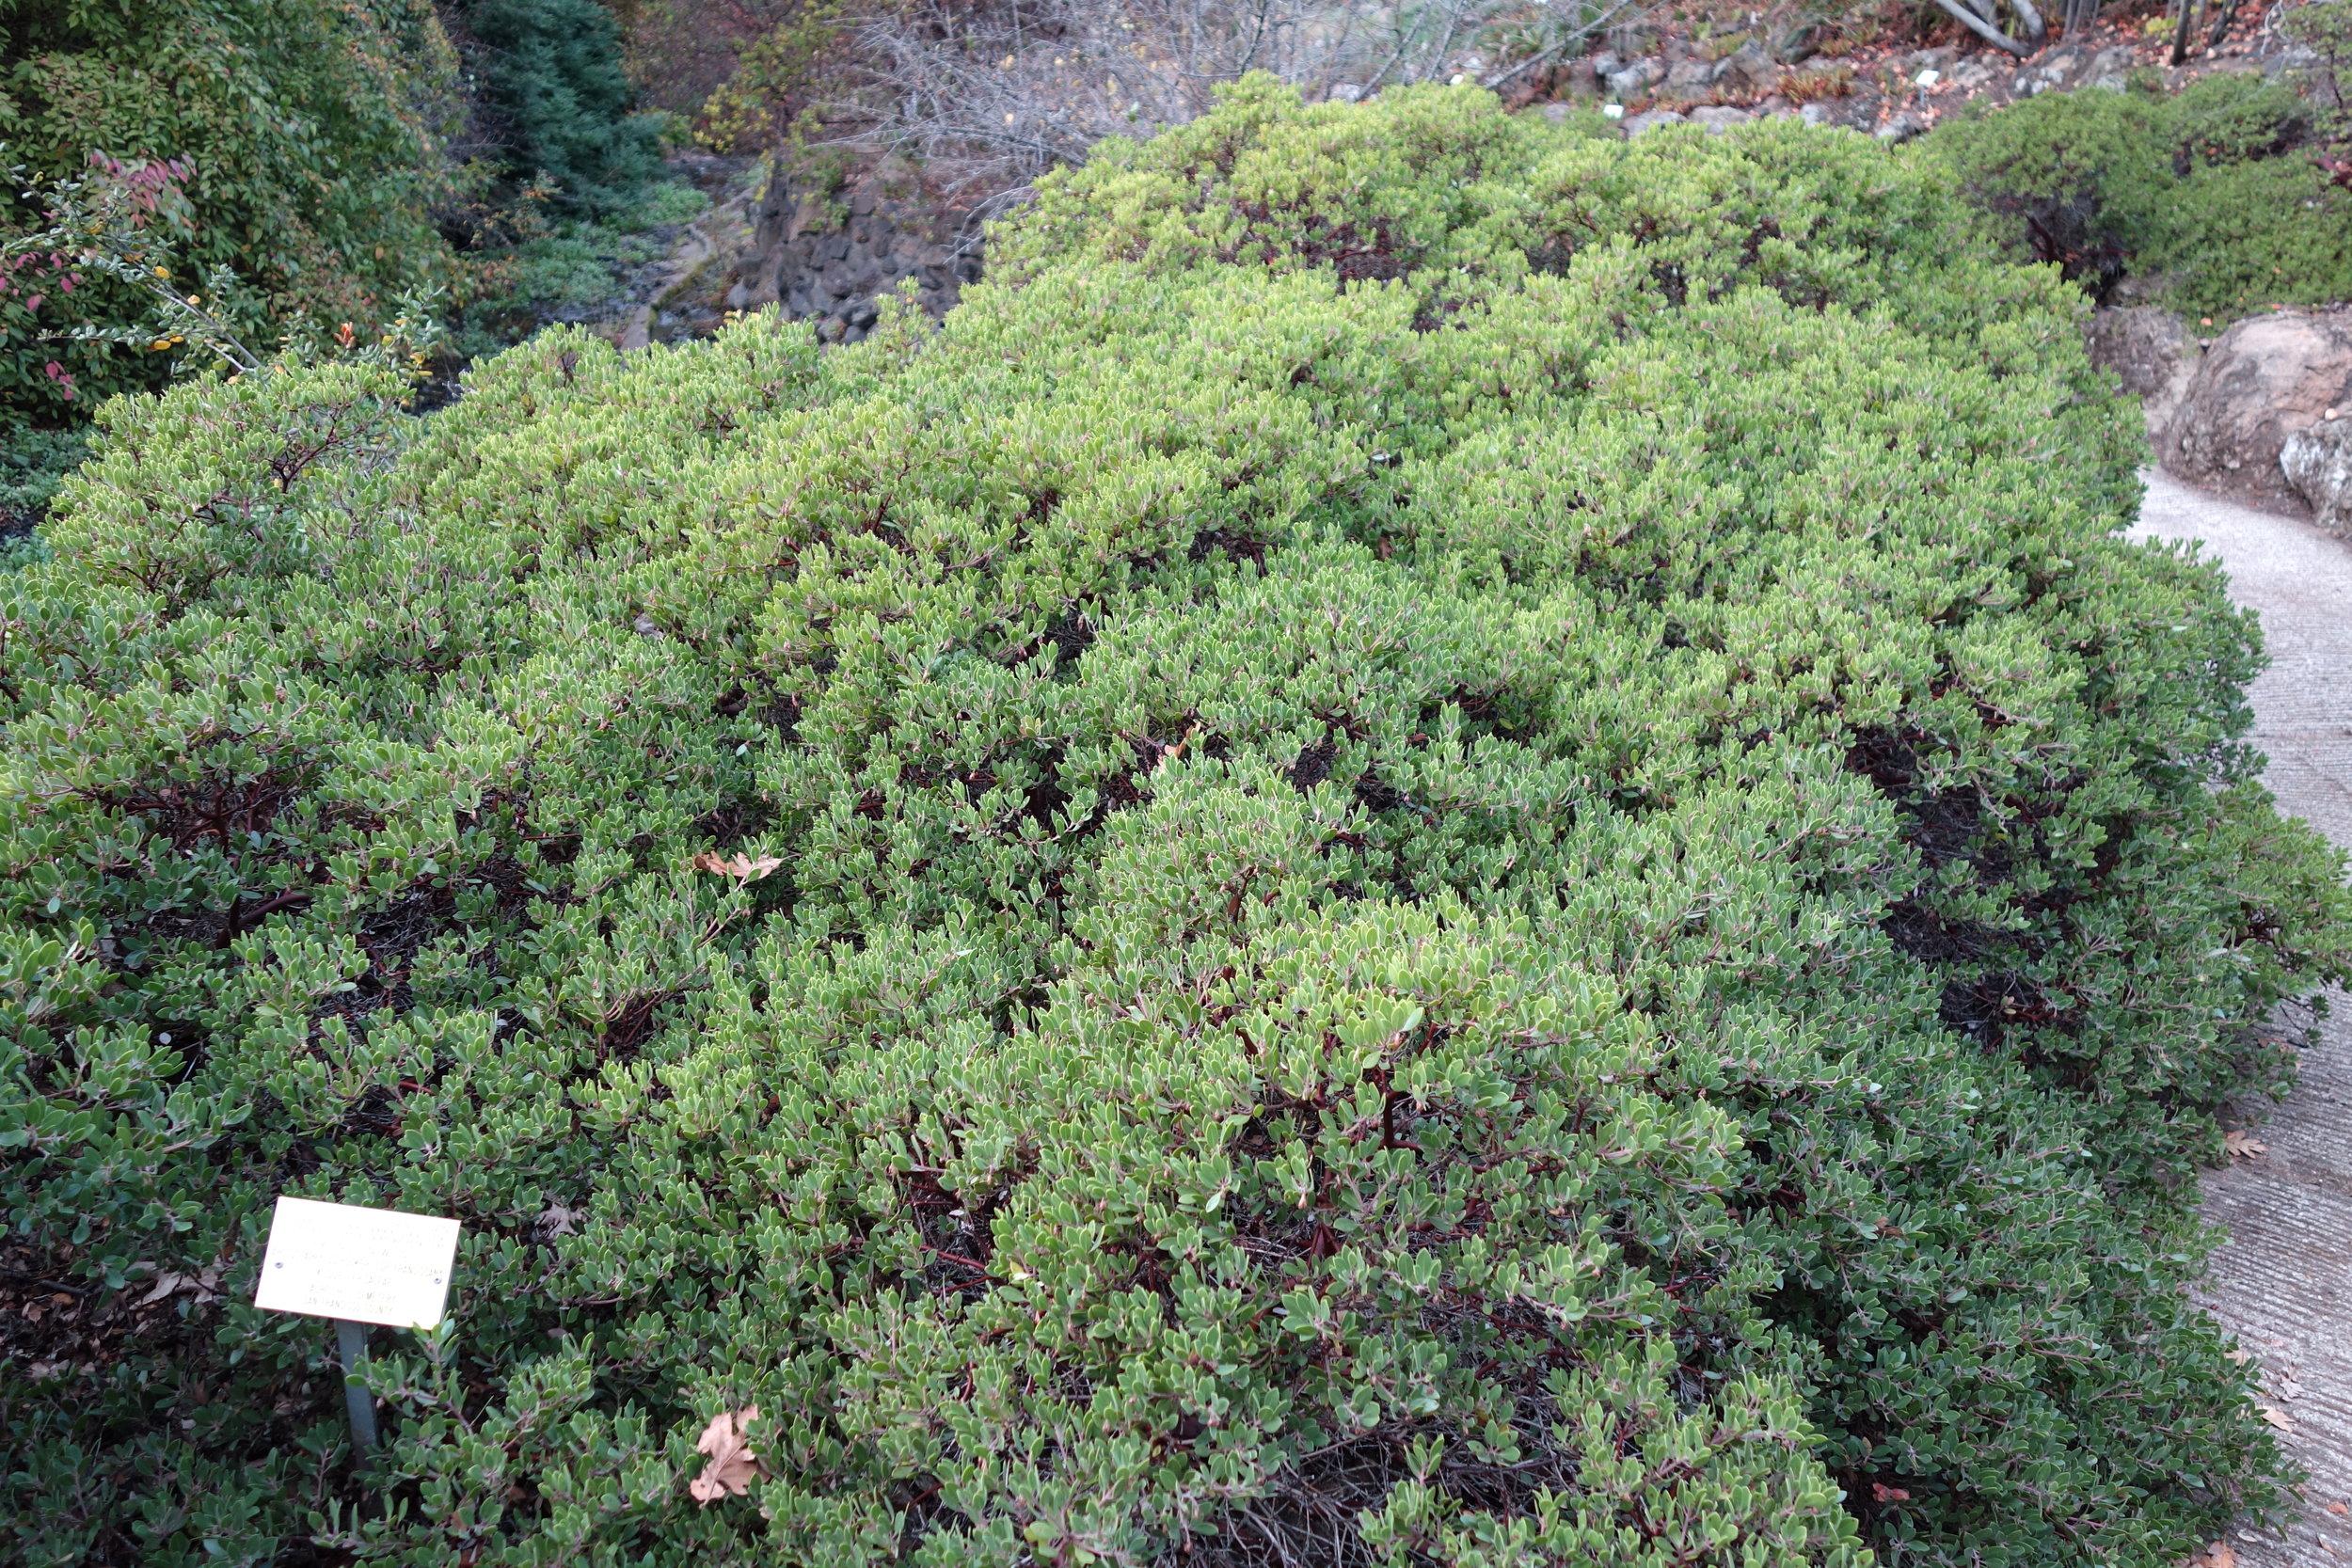 Arctostaphylos_franciscana_-_Regional_Parks_Botanic_Garden,_Berkeley,_CA_-_DSC04529.jpg